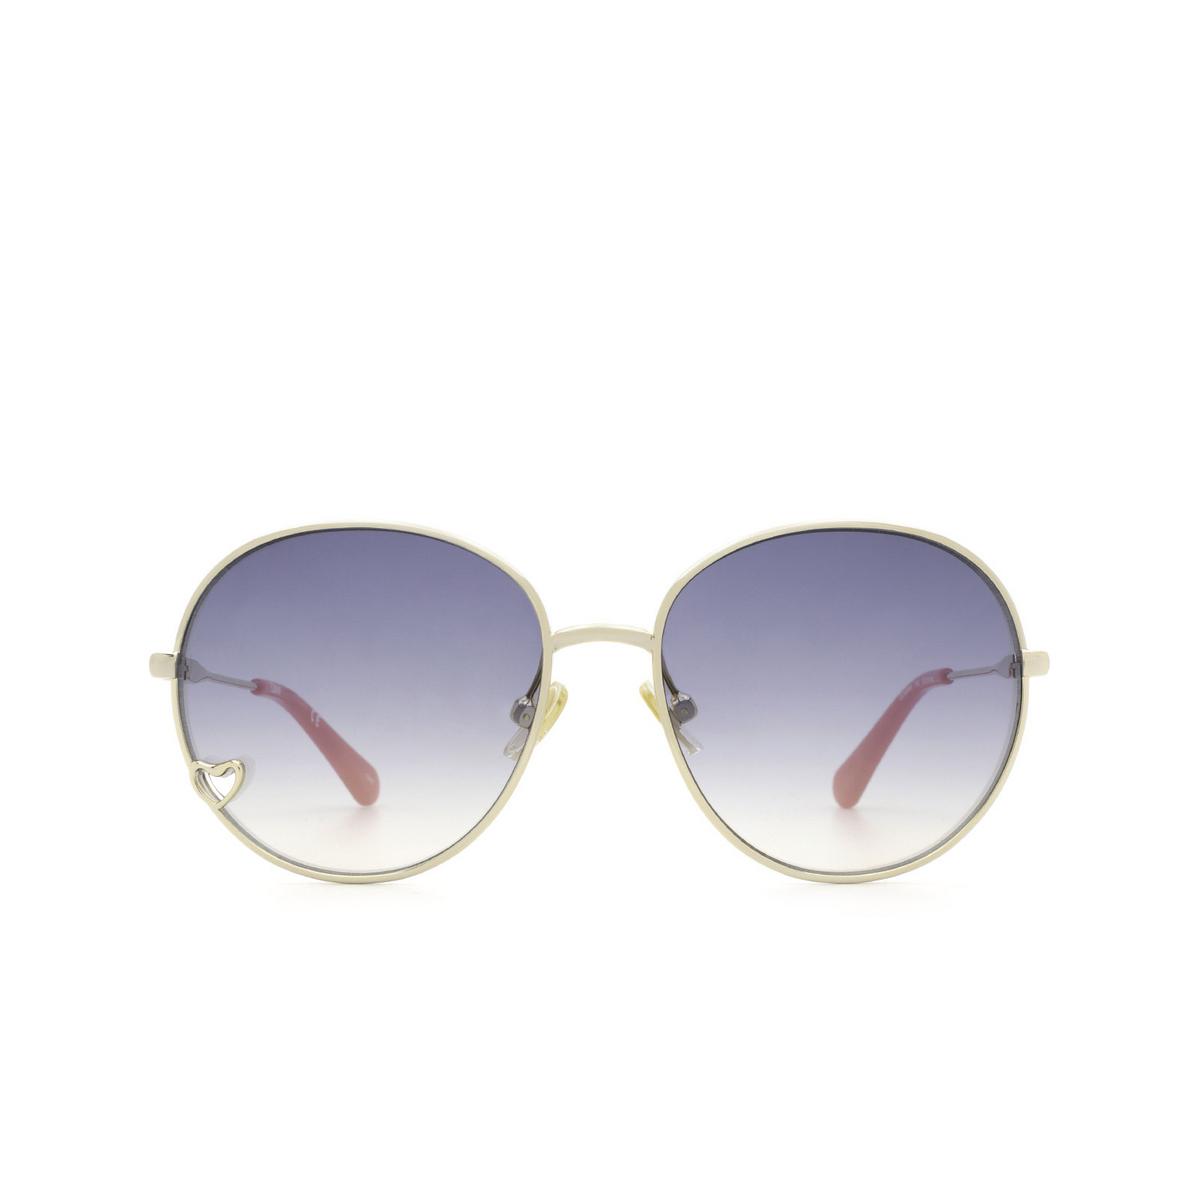 Chloé® Round Sunglasses: CC0006S color Gold 002 - front view.